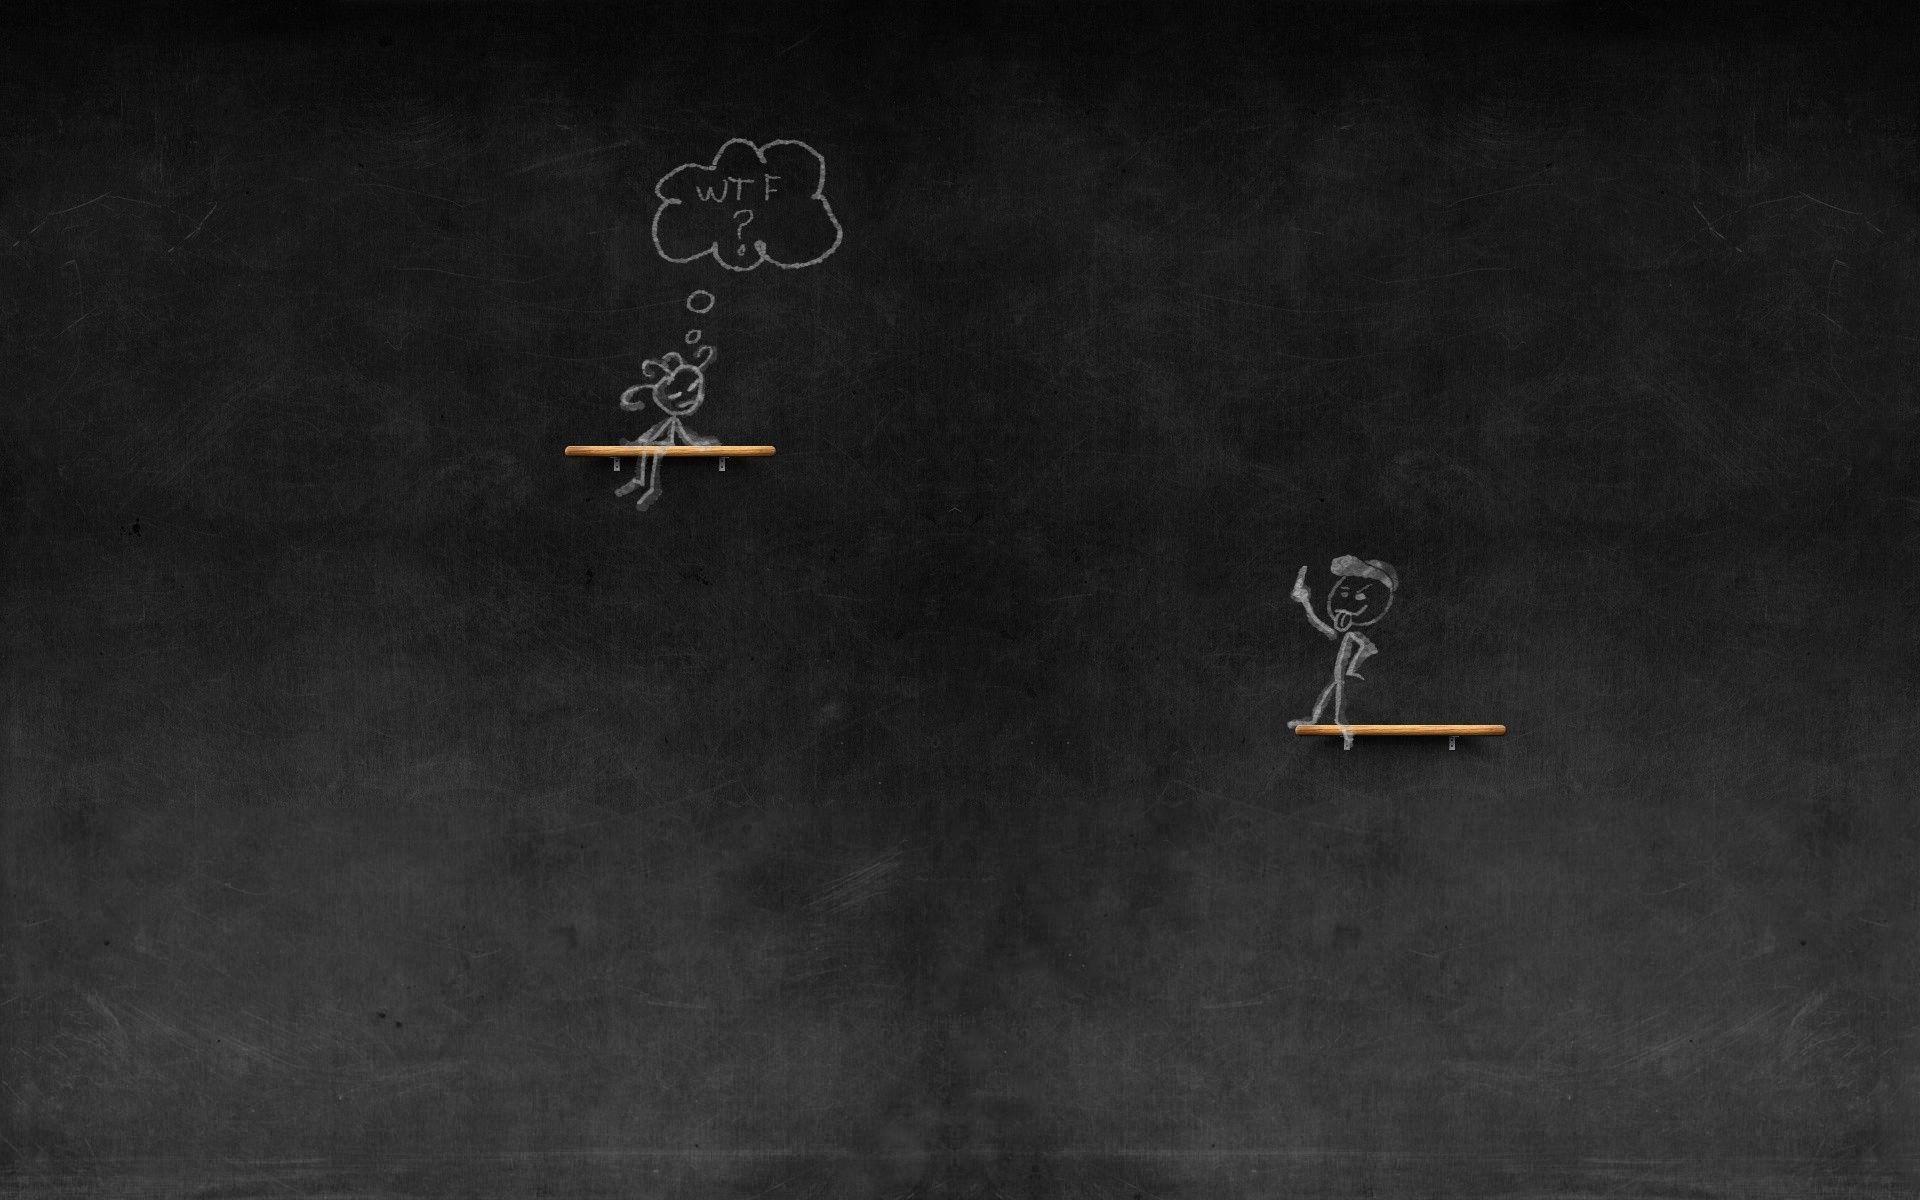 30 Blank Black Wallpaper By Ettie Bourcq Freshwallpaperszone Com